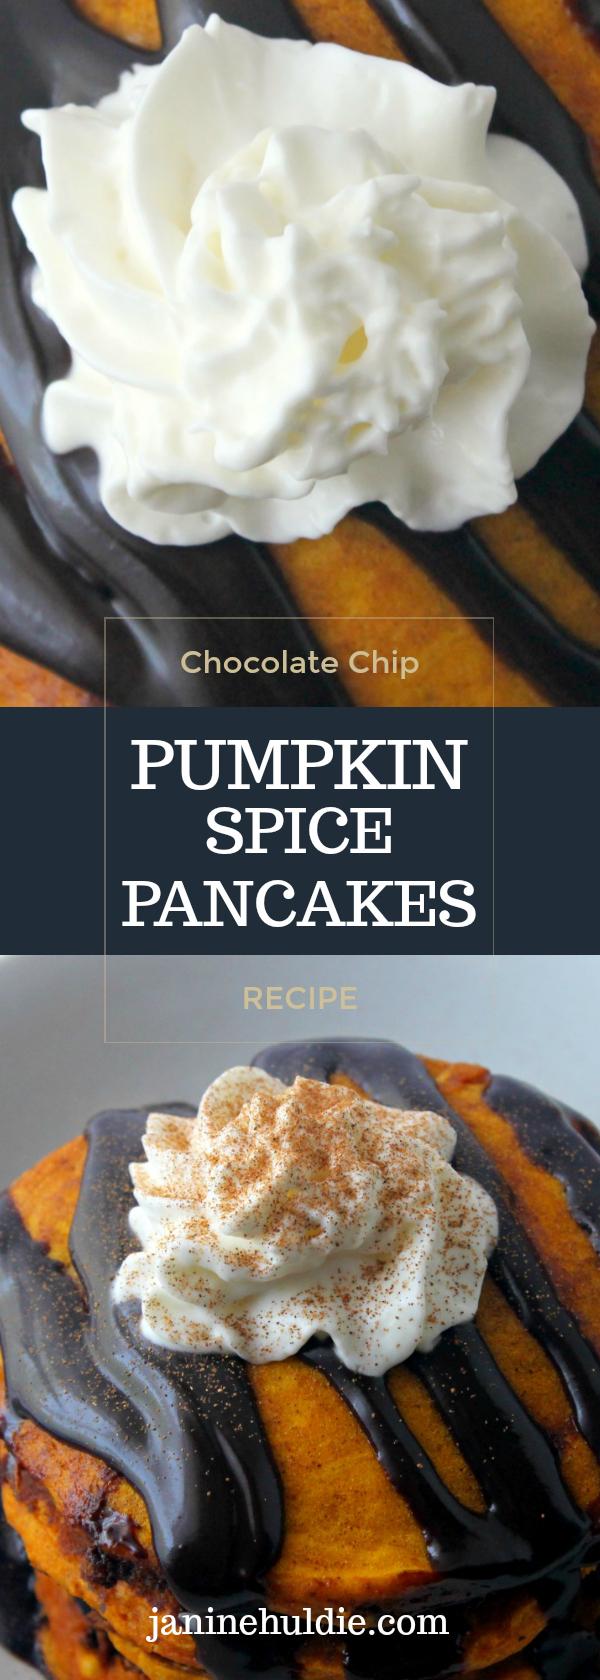 Chocolate Chip Pumpkin Spice Pancakes Long Pin